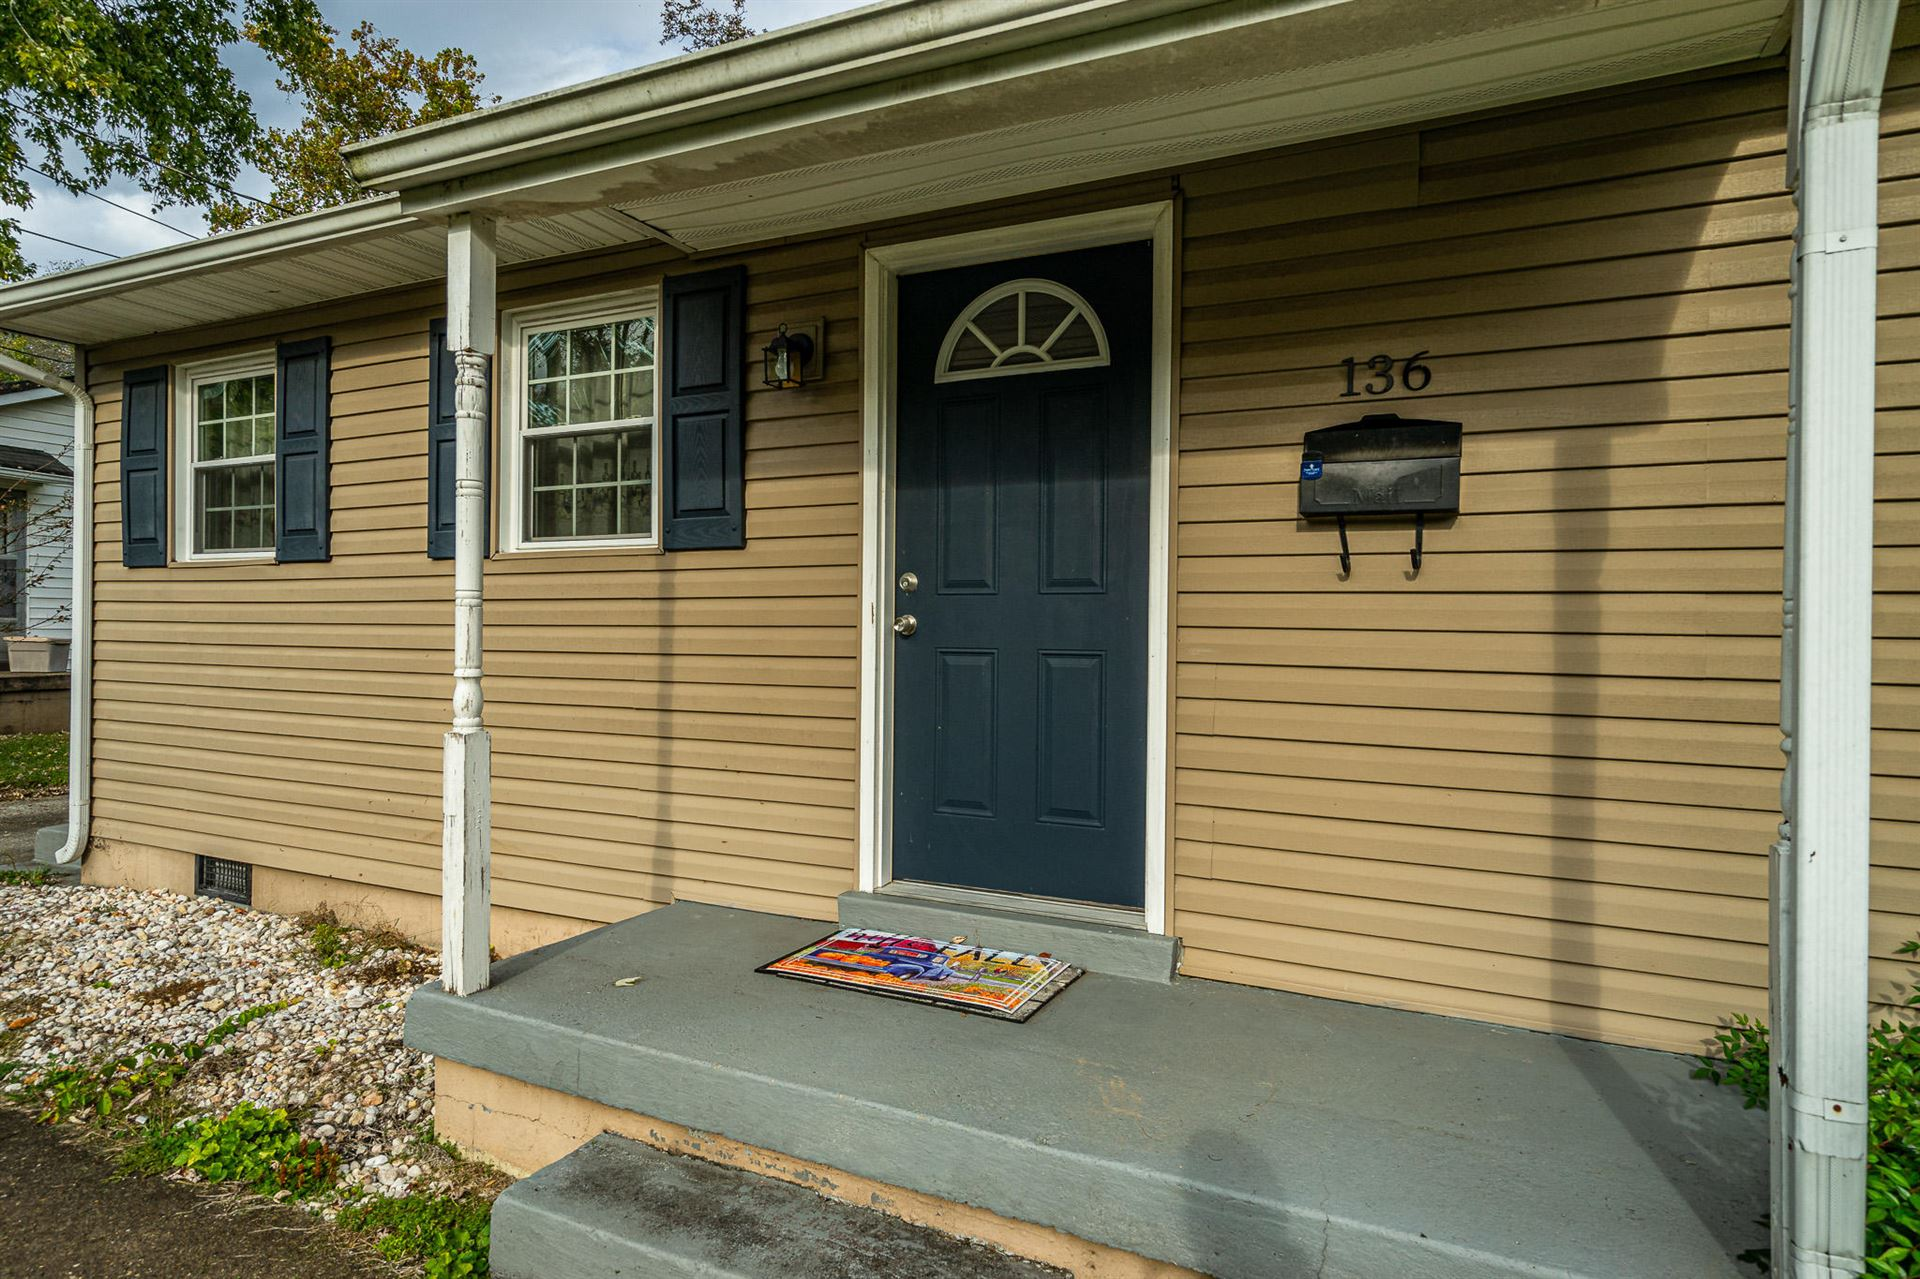 Photo of 136 Athens Rd, Oak Ridge, TN 37830 (MLS # 1133221)